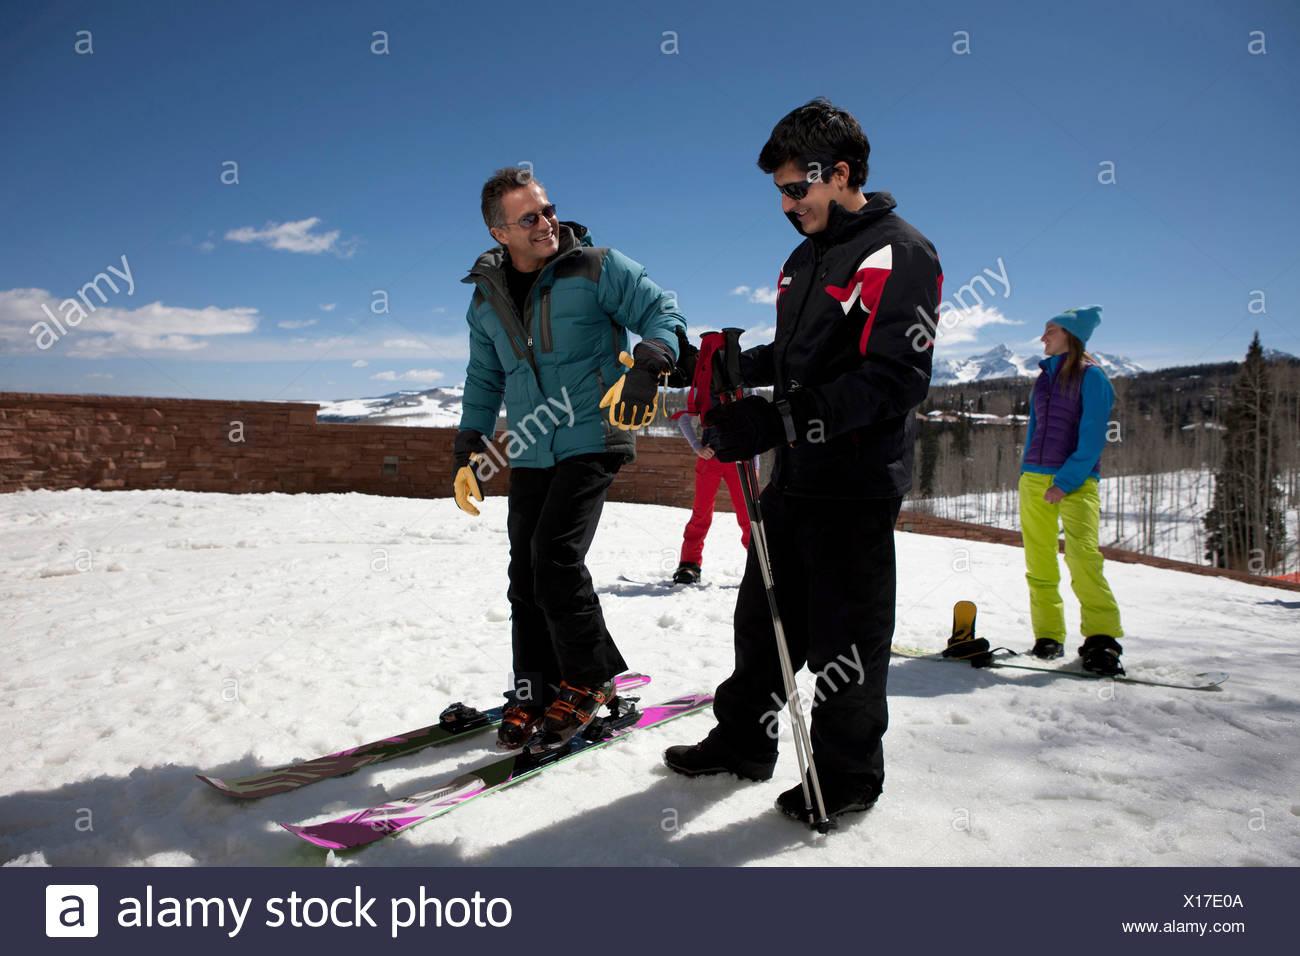 Mature man with ski instructor on ski slope - Stock Image